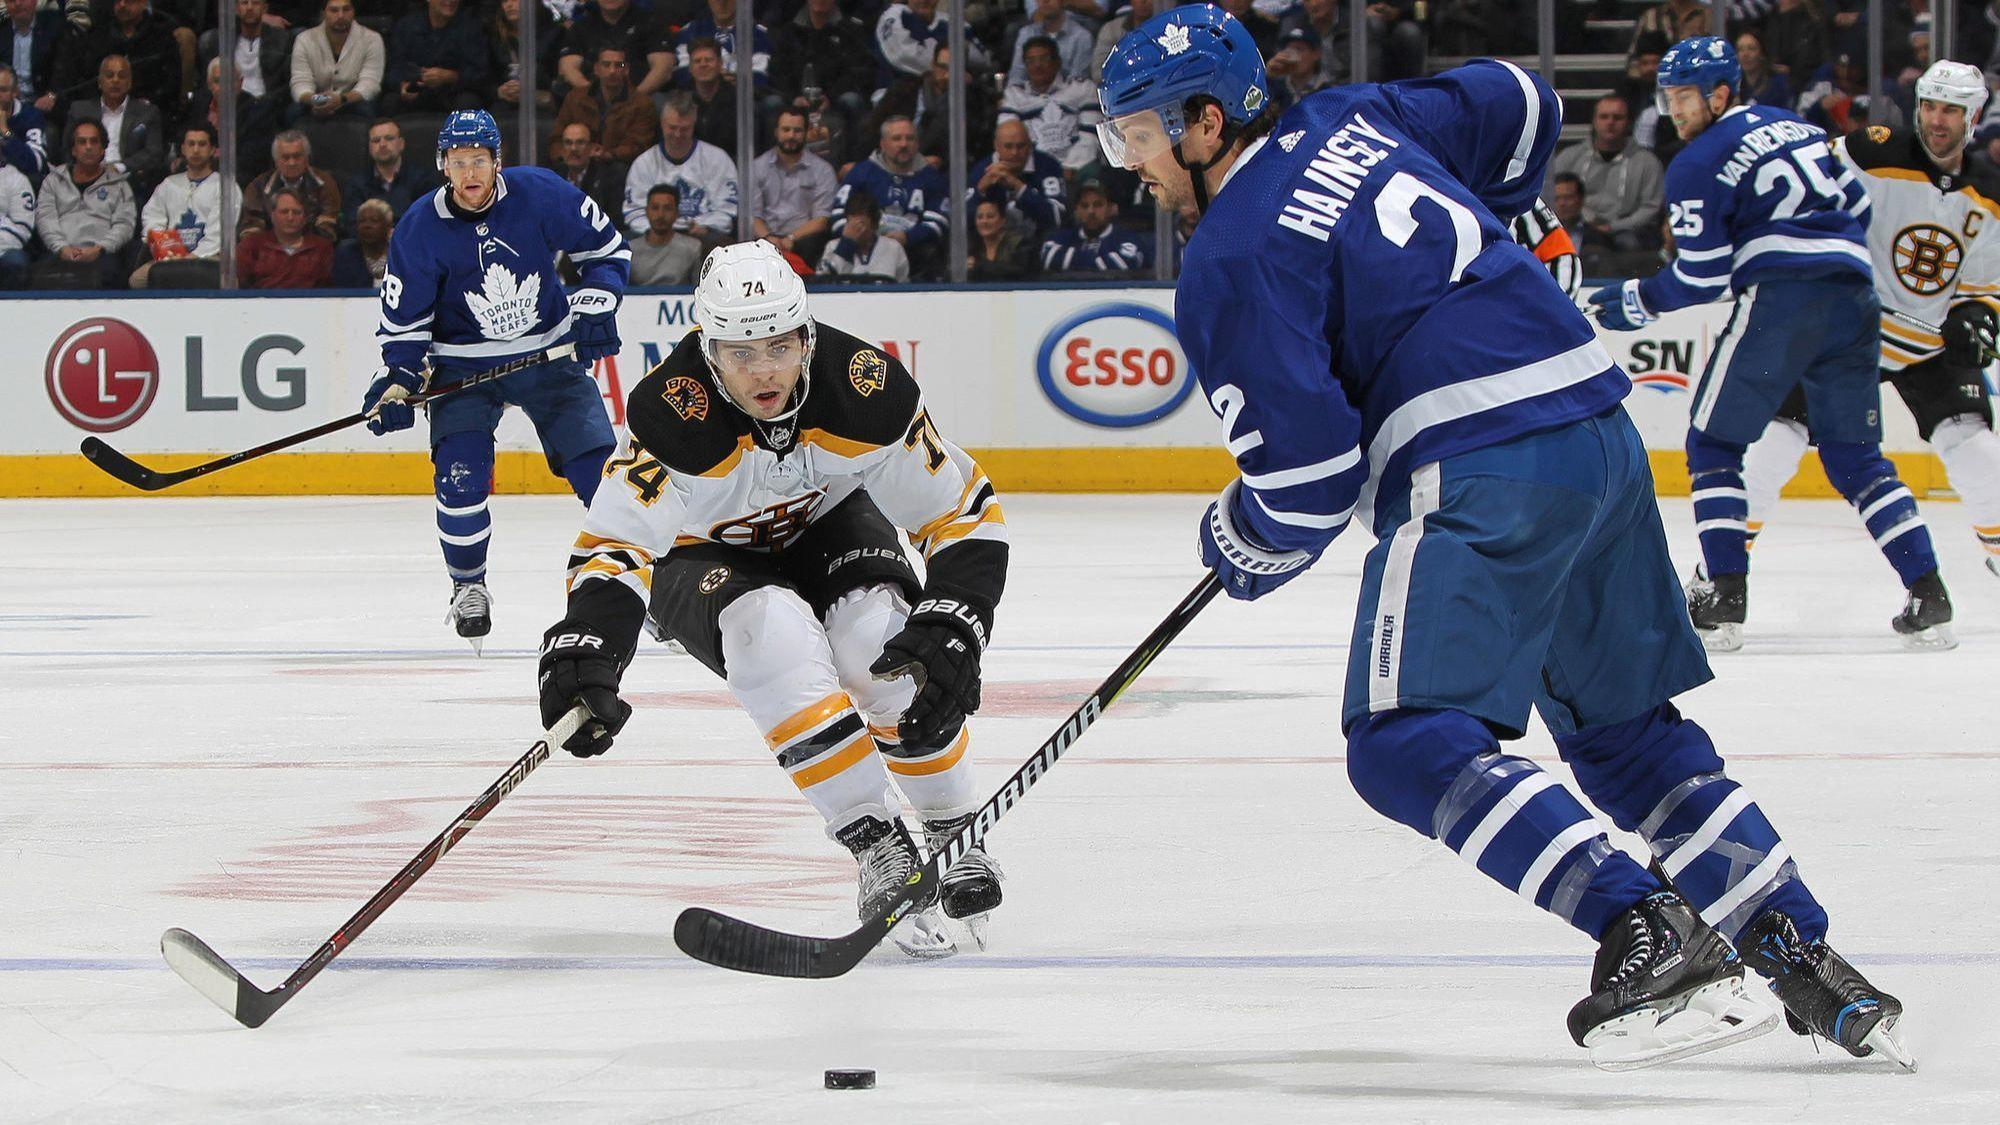 NHL playoffs  Bruins beat Maple Leafs 3-1 in Game 4 - Sun Sentinel 0fb0ba0f5